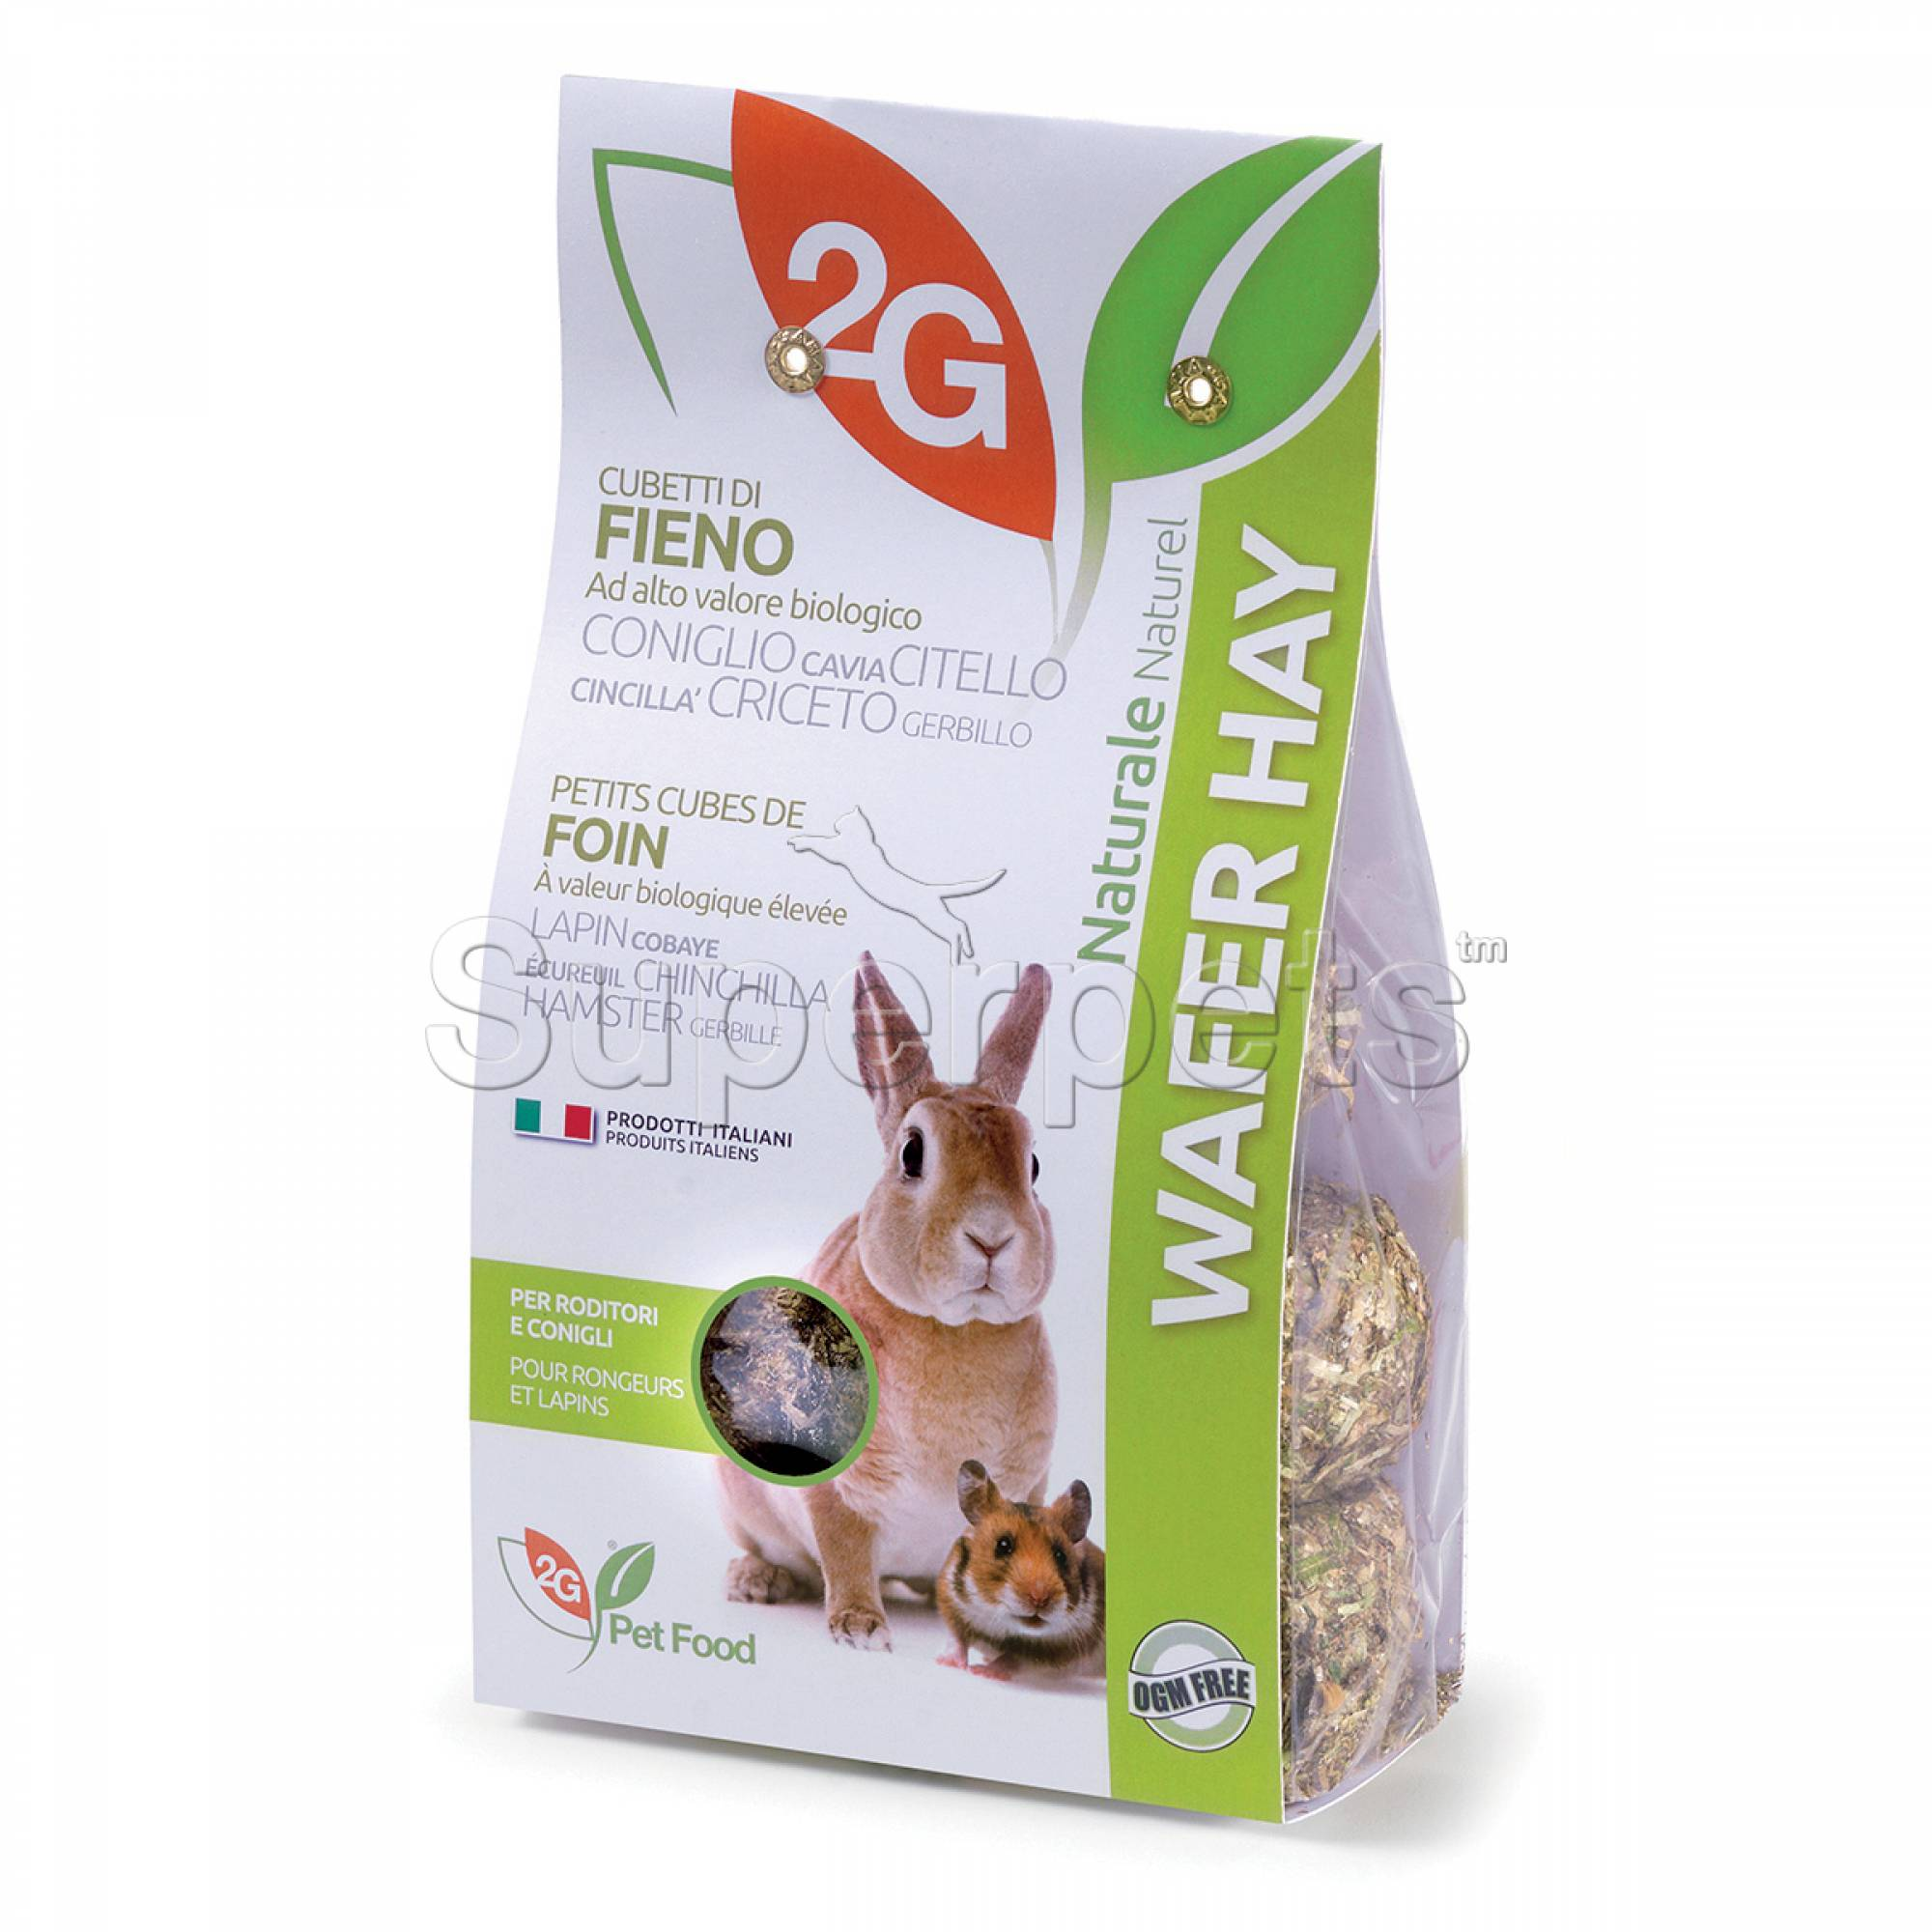 2G Pet Food - Wafer Hay 350g